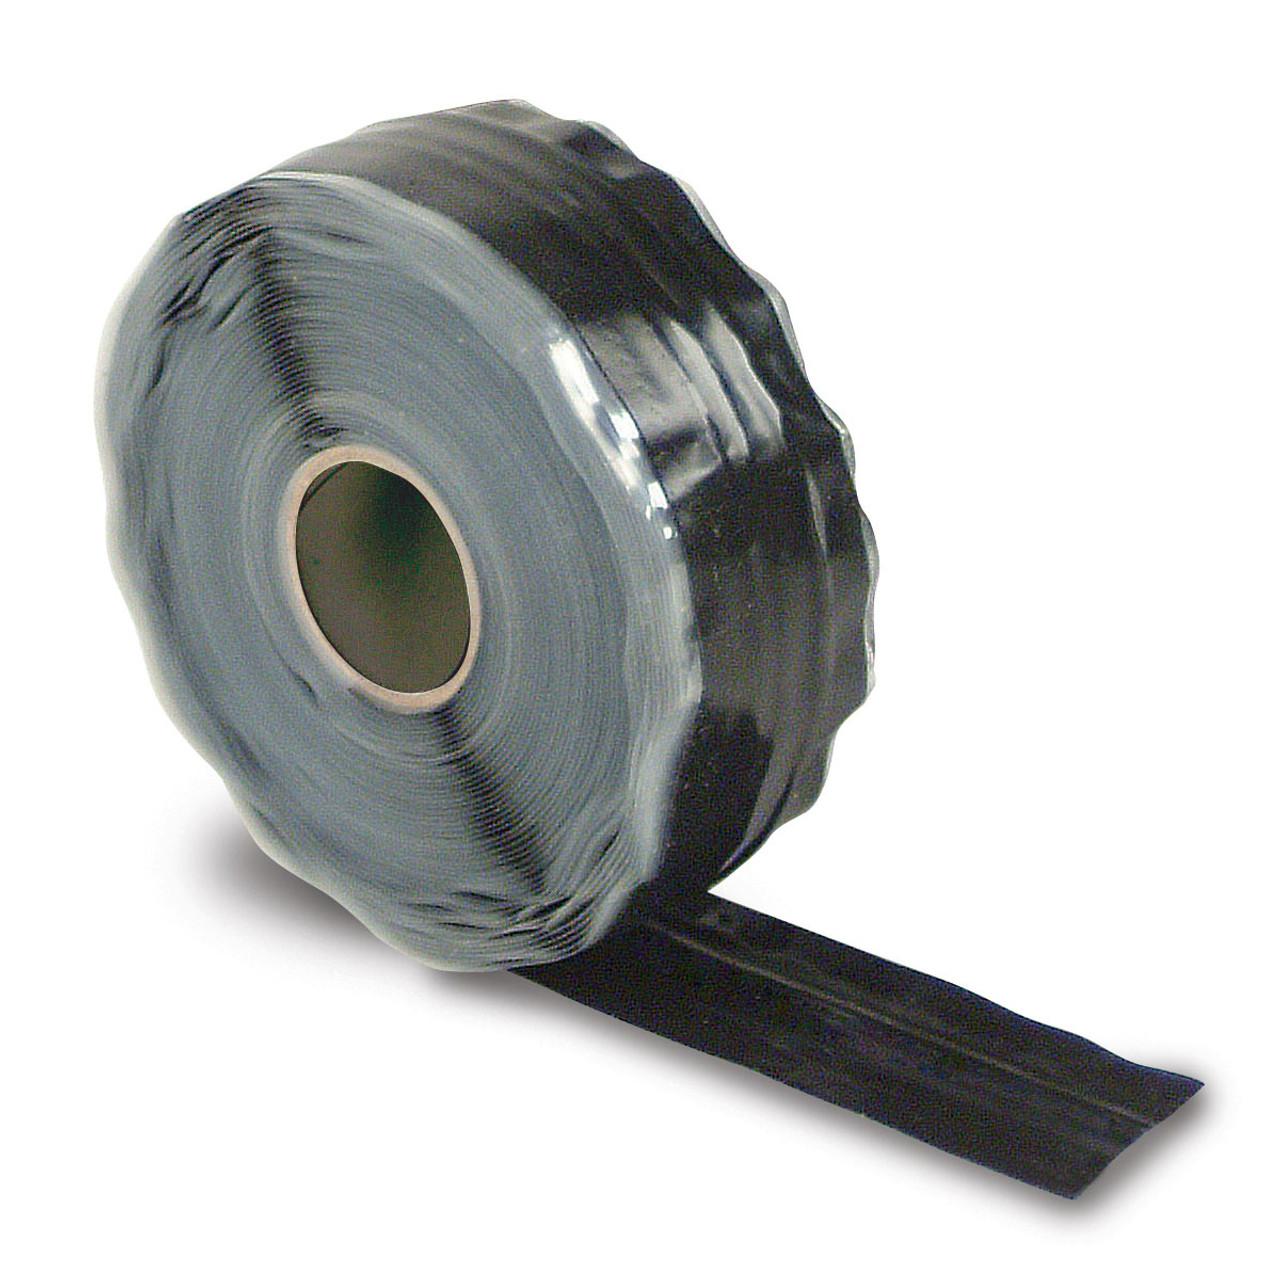 [FPWZ_2684]  Fire Tape / Self Vulcanizing | Design Engineering Inc | Triumph Wiring Harness Repair Tape |  | Design Engineering, Inc.